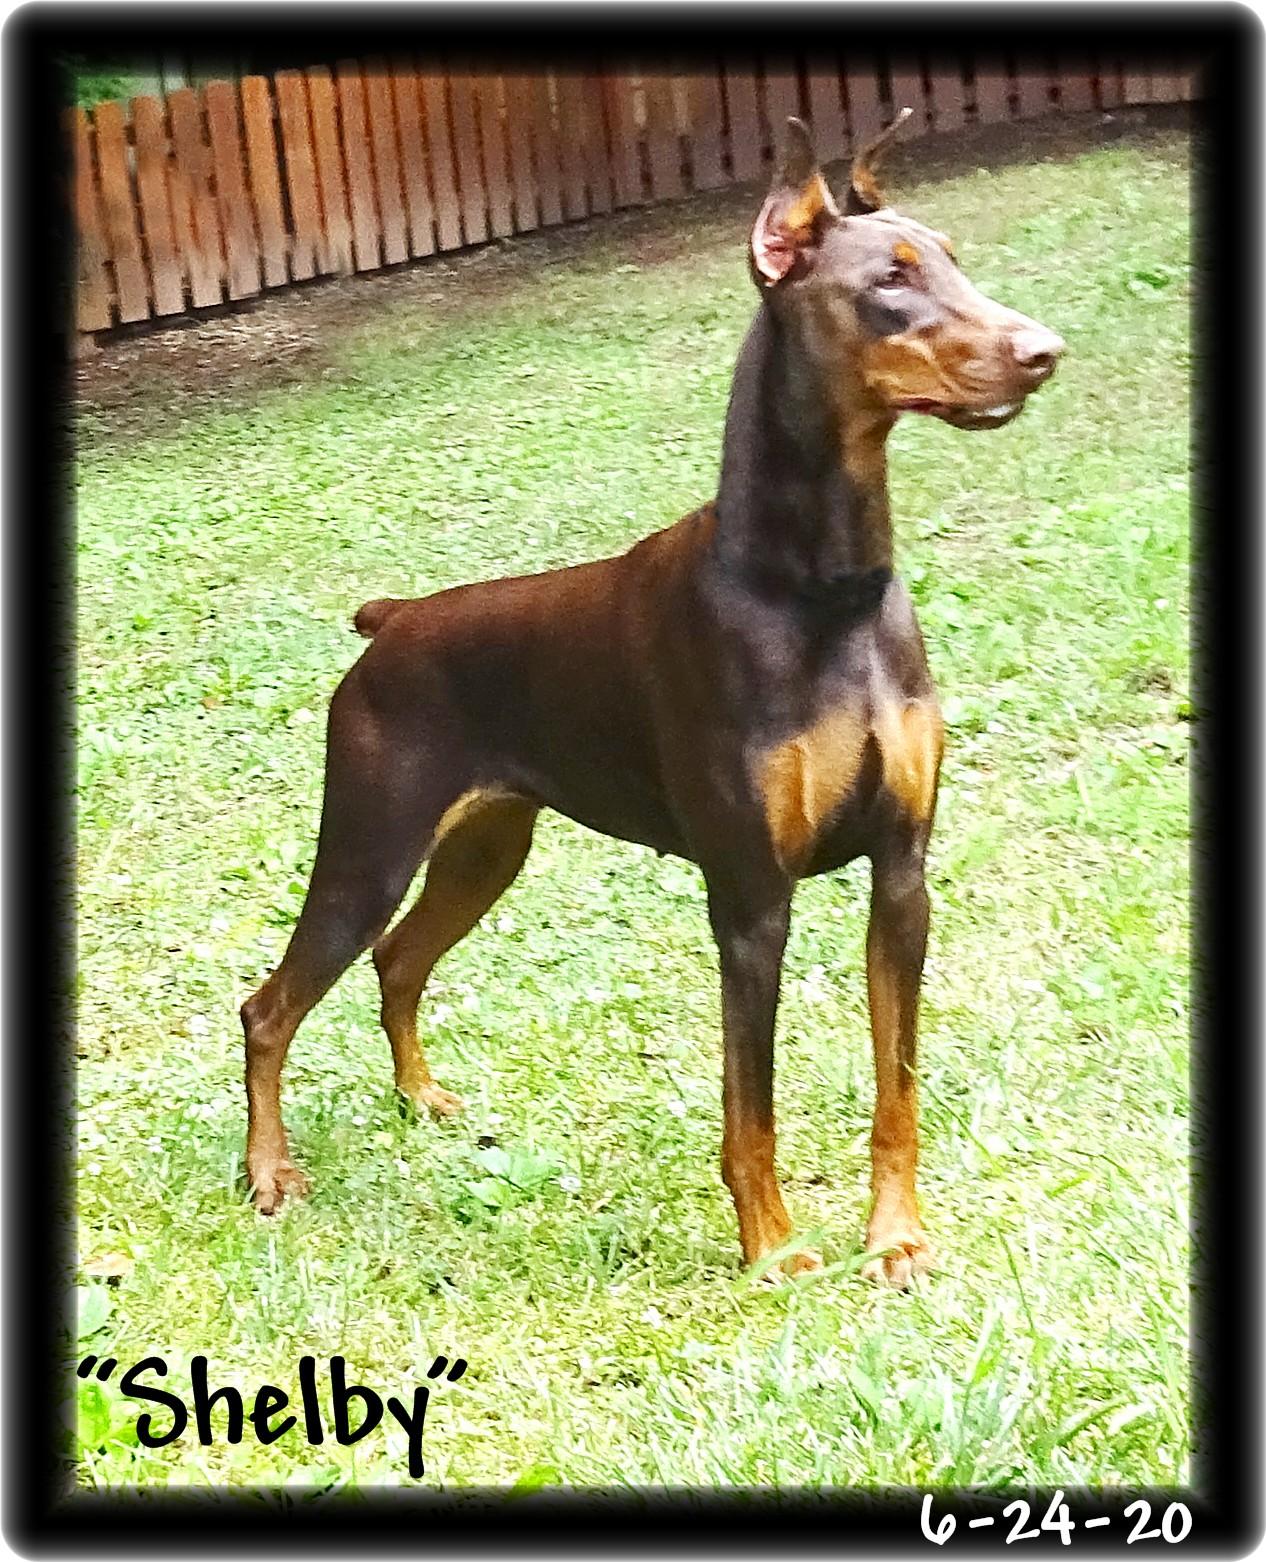 shelby-115.jpg